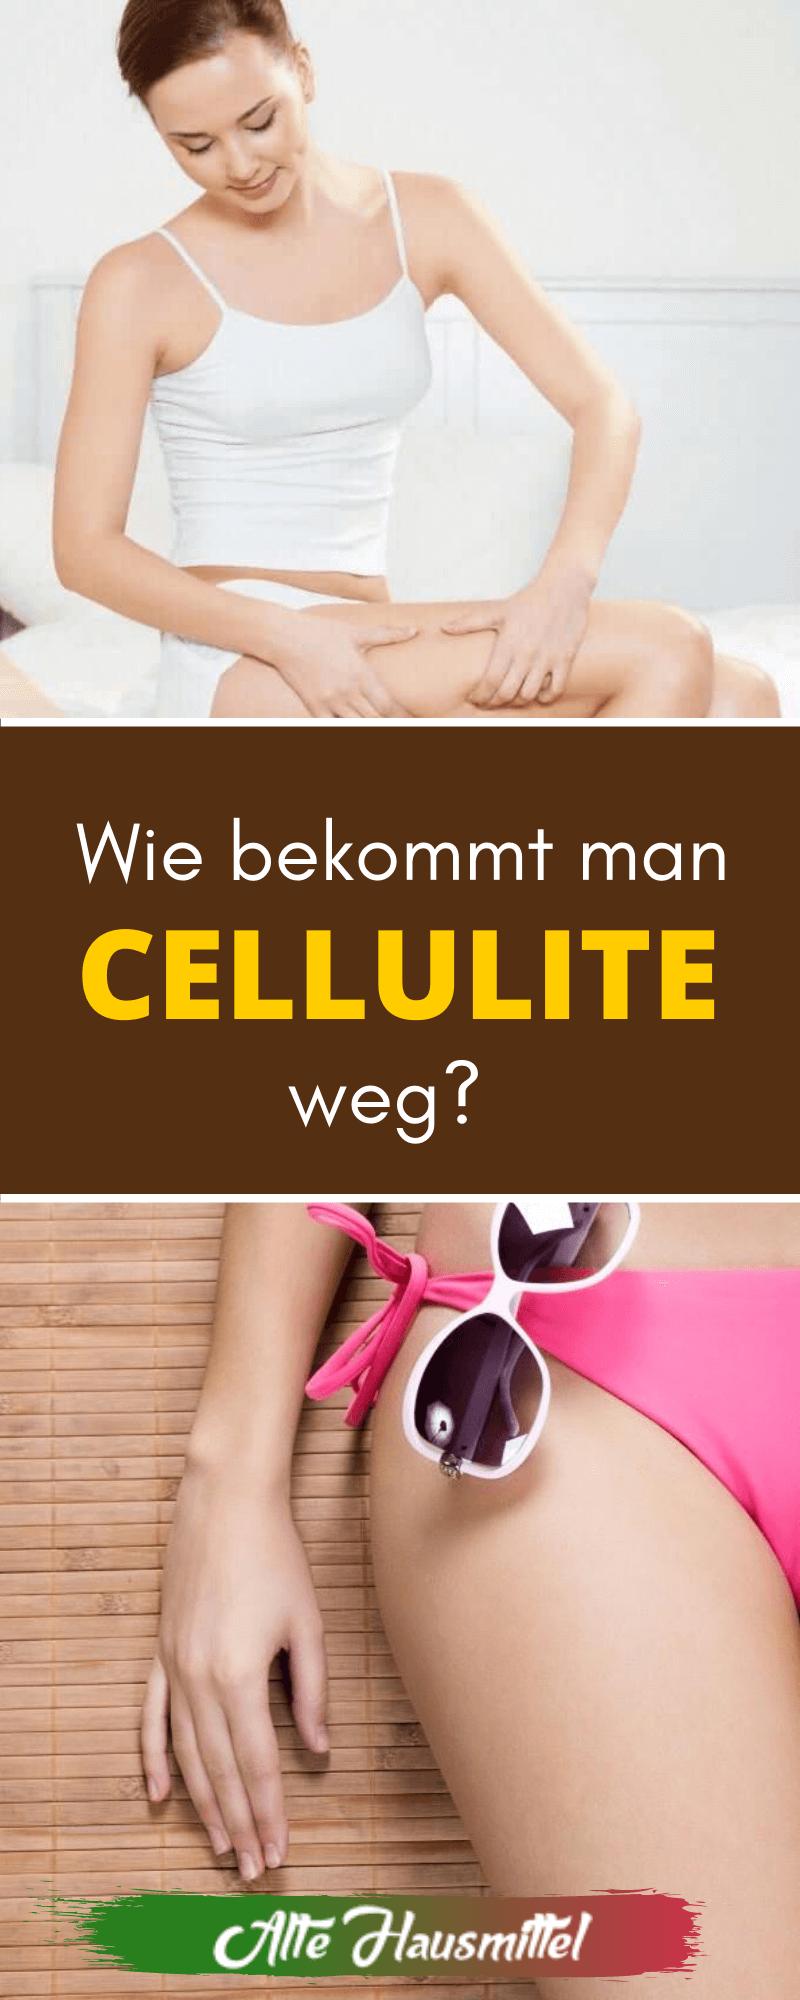 Wie bekommt man Cellulite weg?